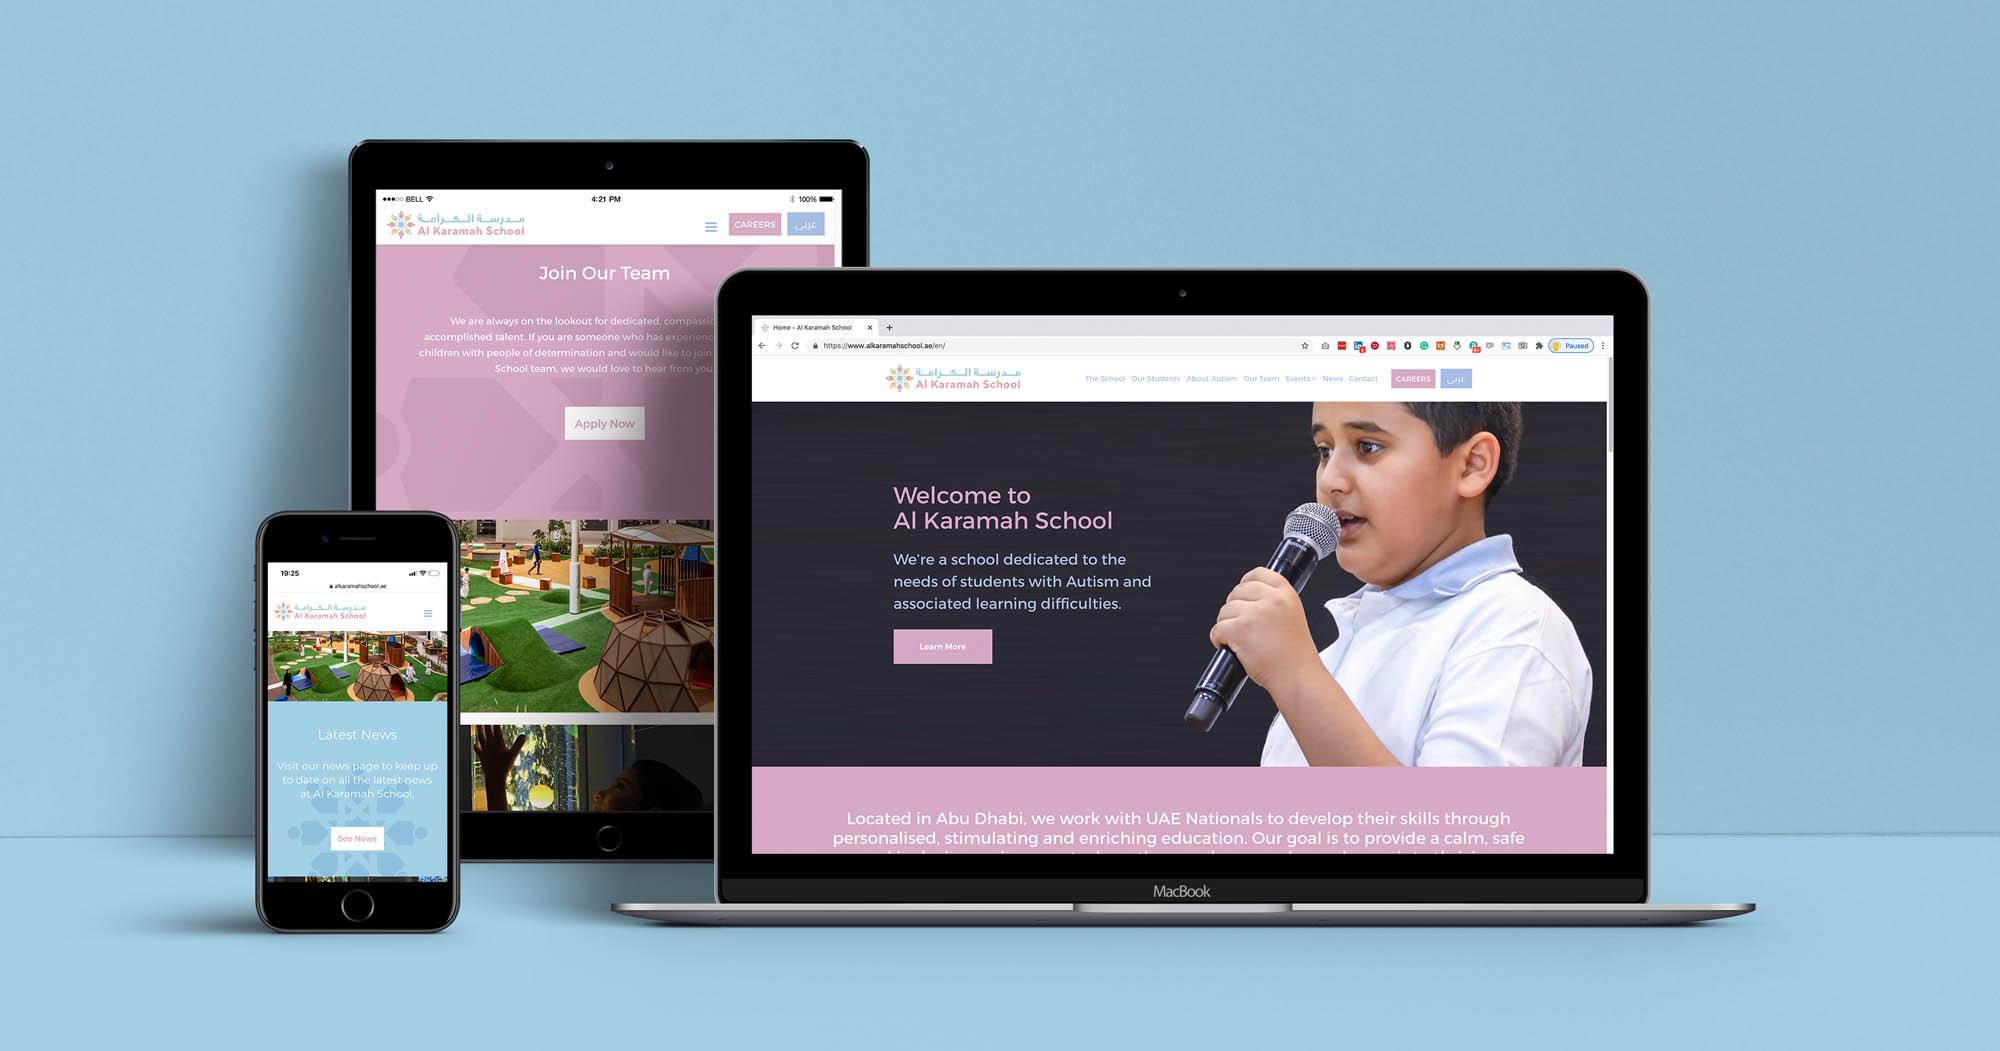 al-karamah-school-abu-dhabi-website-design